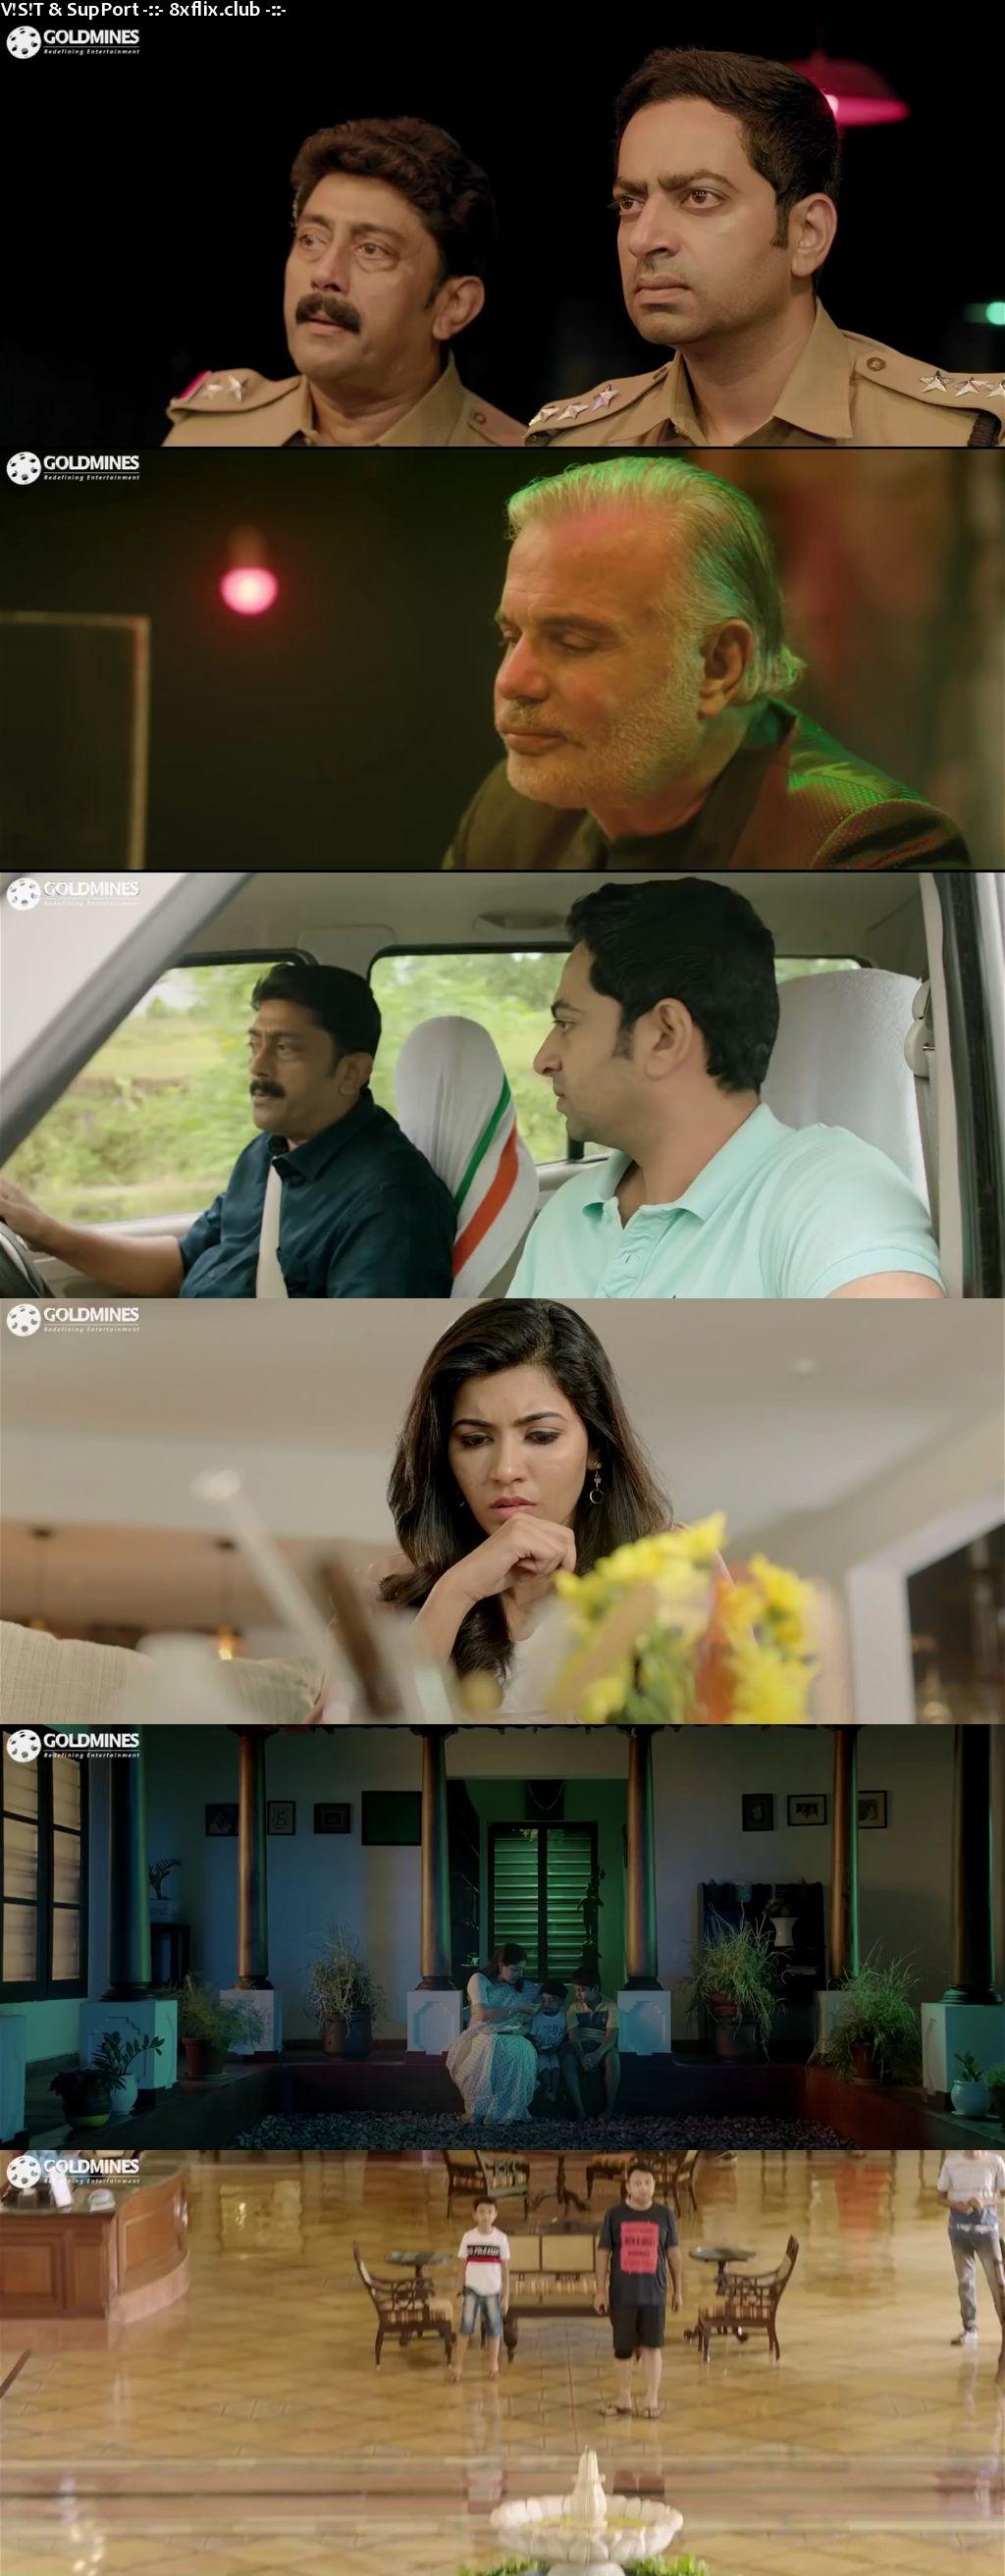 Jack And Daniel 2021 Full Movie Hindi Dubbed 720p 480p HDRip